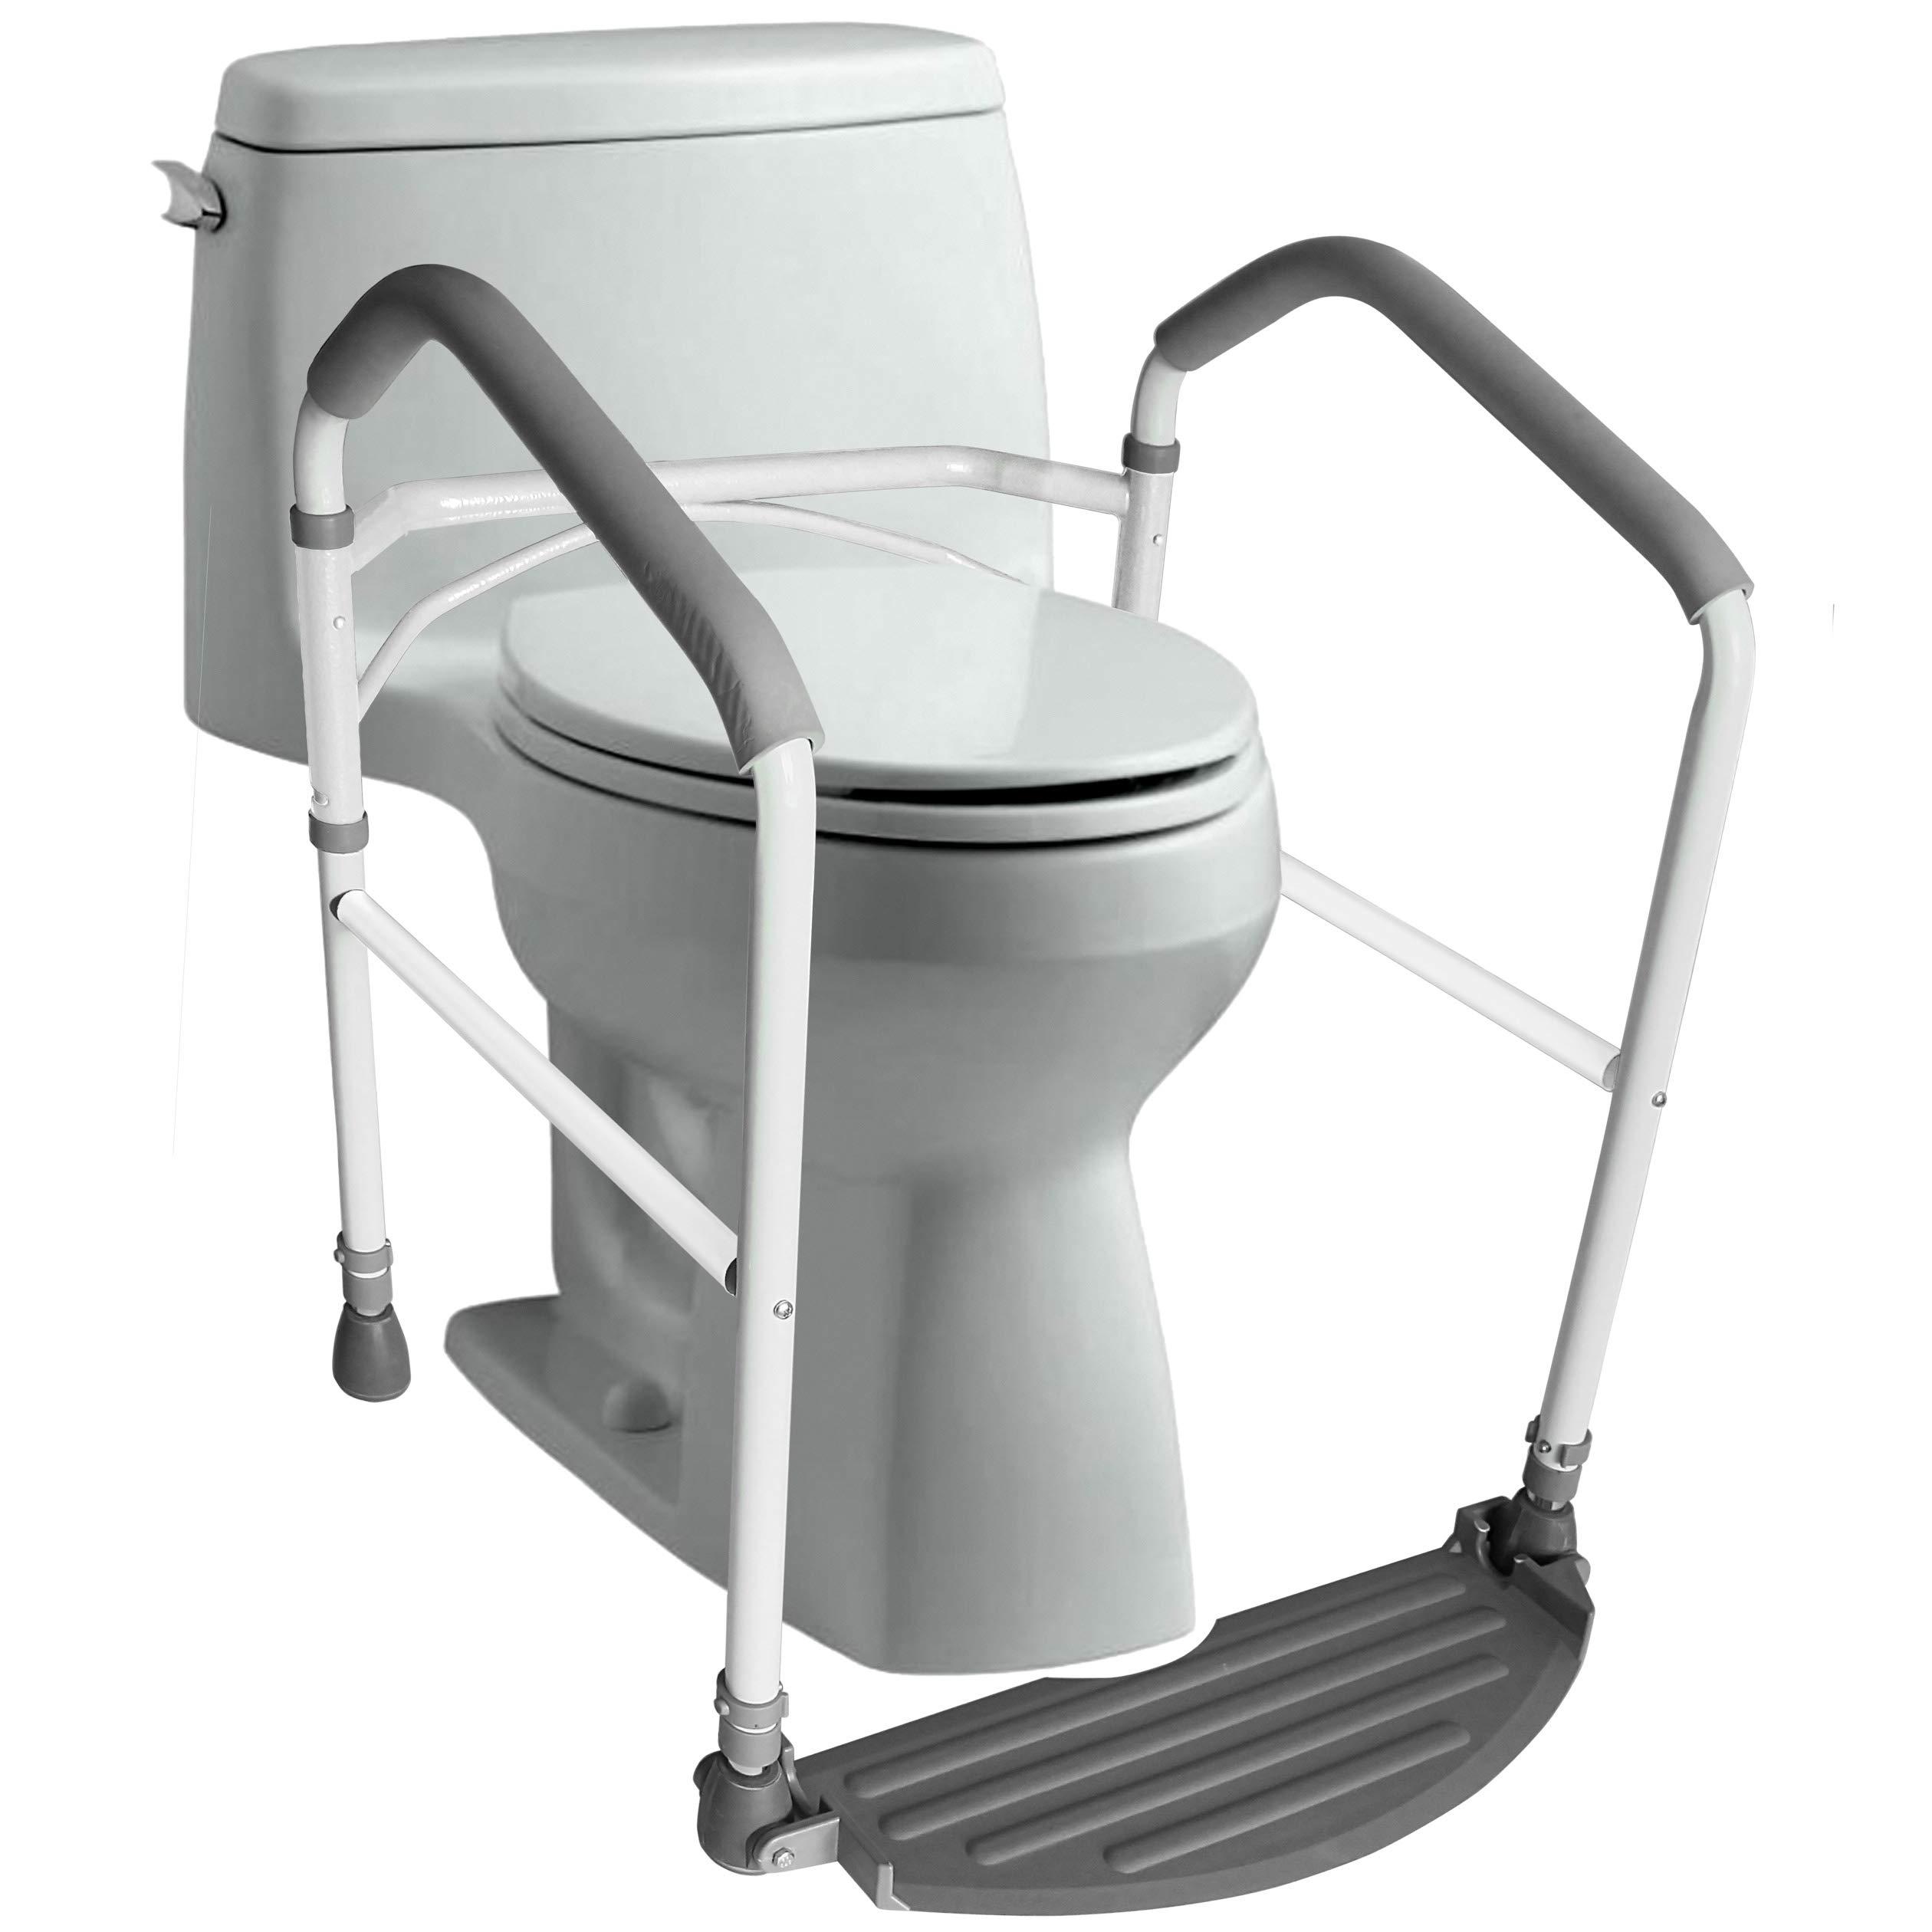 Amazon Com Rms Toilet Safety Frame Rail Folding Portable Bathroom Toilet Safety Rails Handrail Toilet Bars With Adjustable Height White Furniture Decor